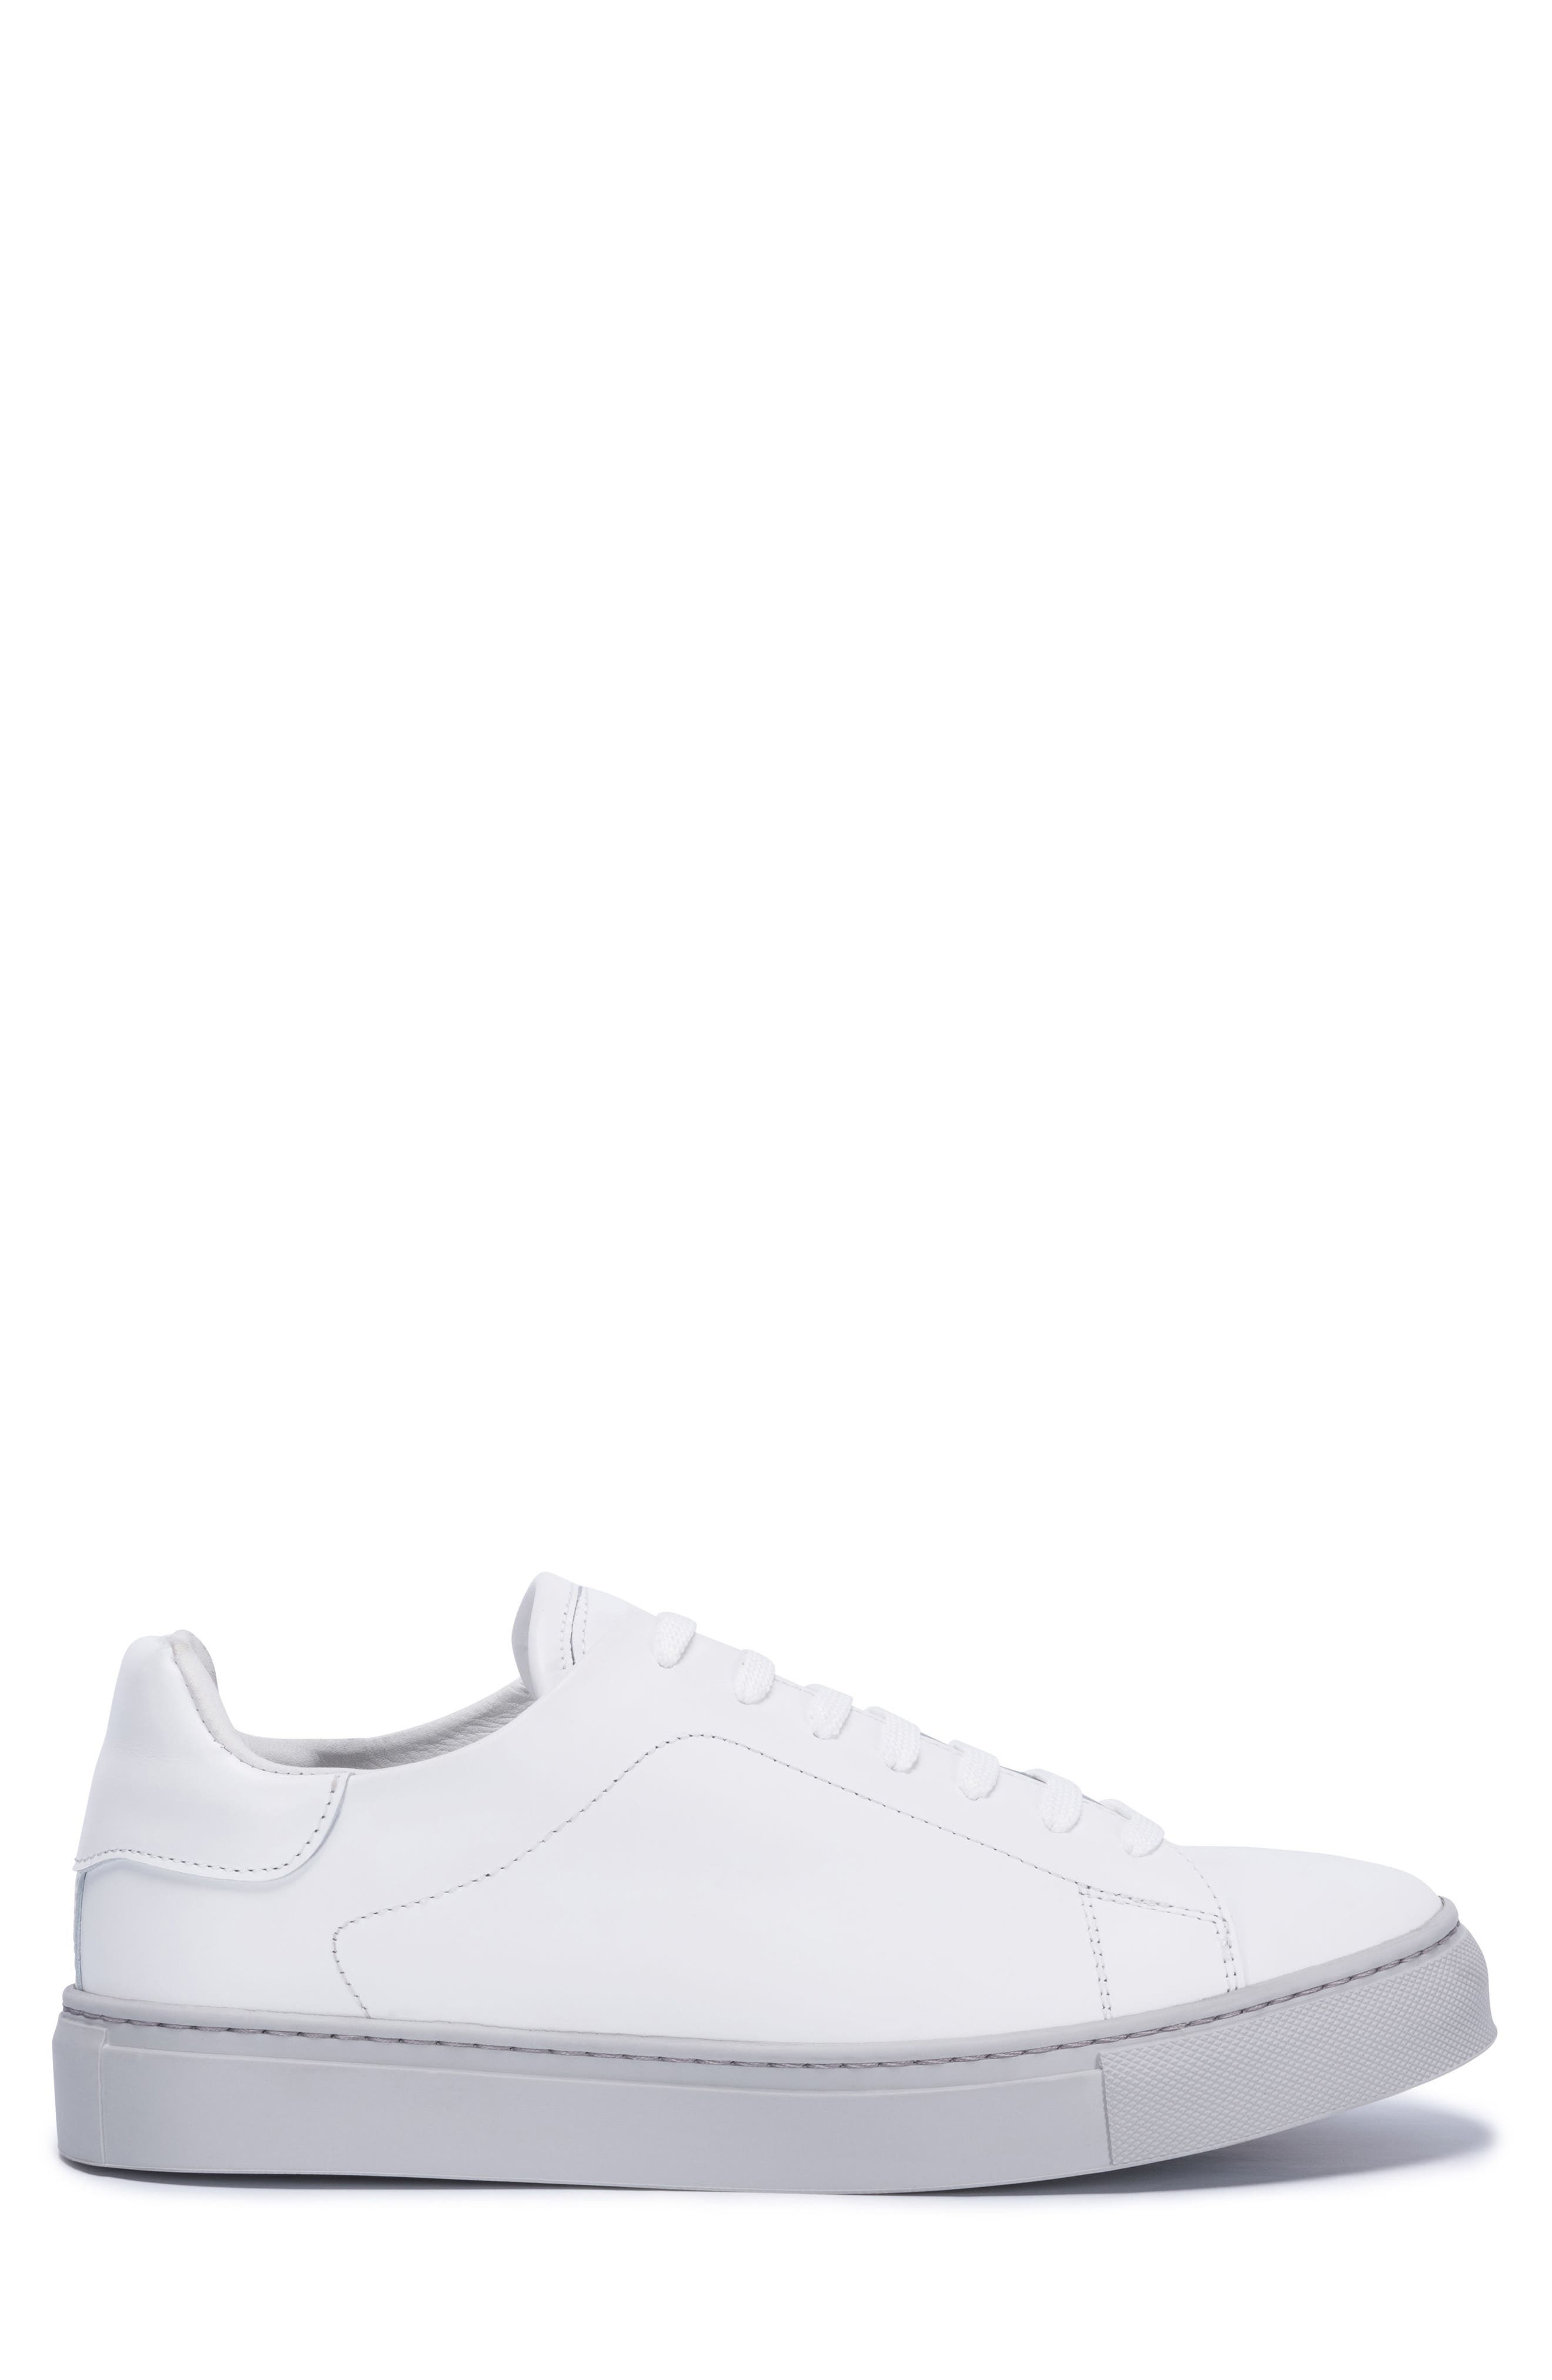 Massa Sneaker,                             Alternate thumbnail 3, color,                             Bianco Leather